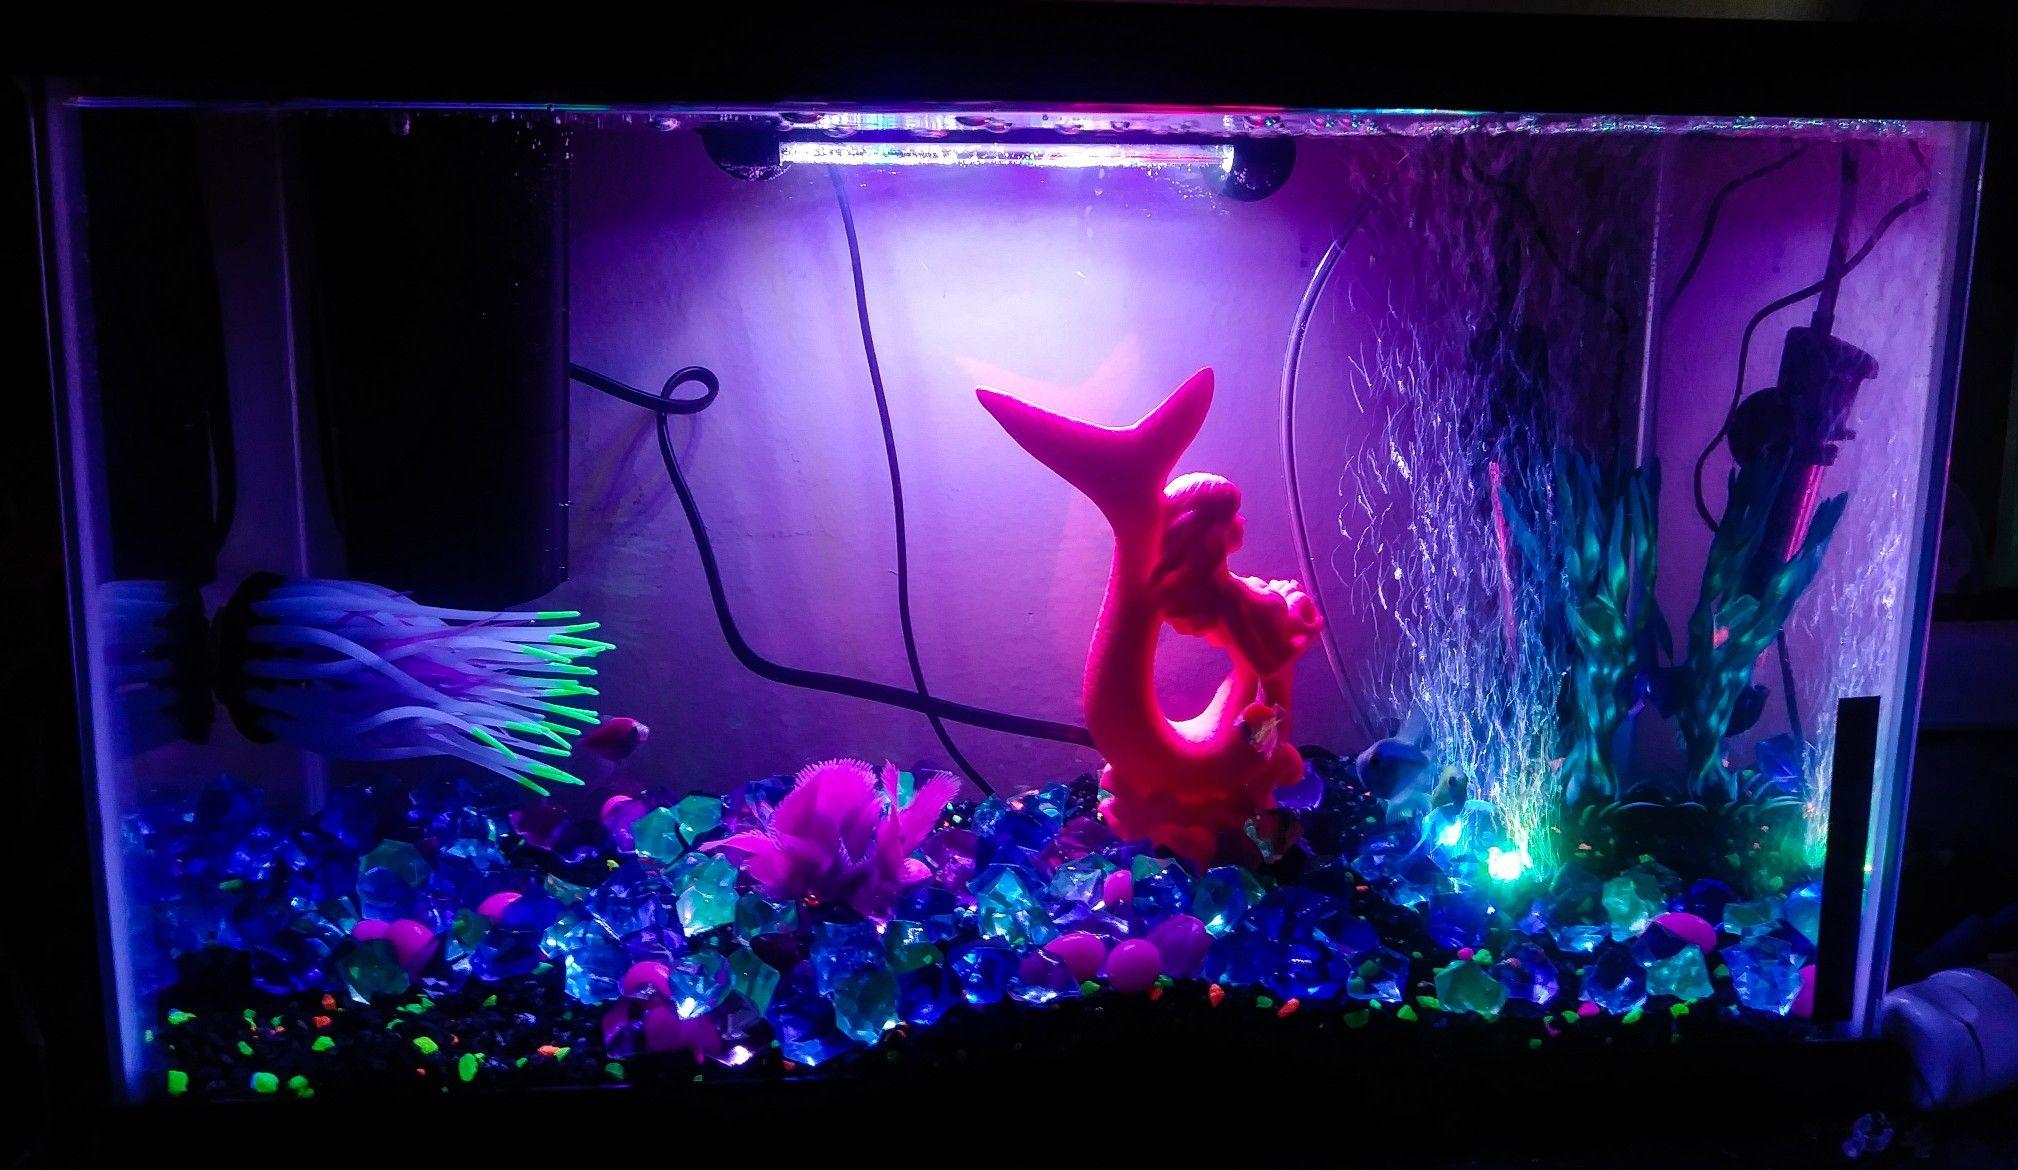 10 gallon glo fish tank contains: glo fish black+rainbow flourescent